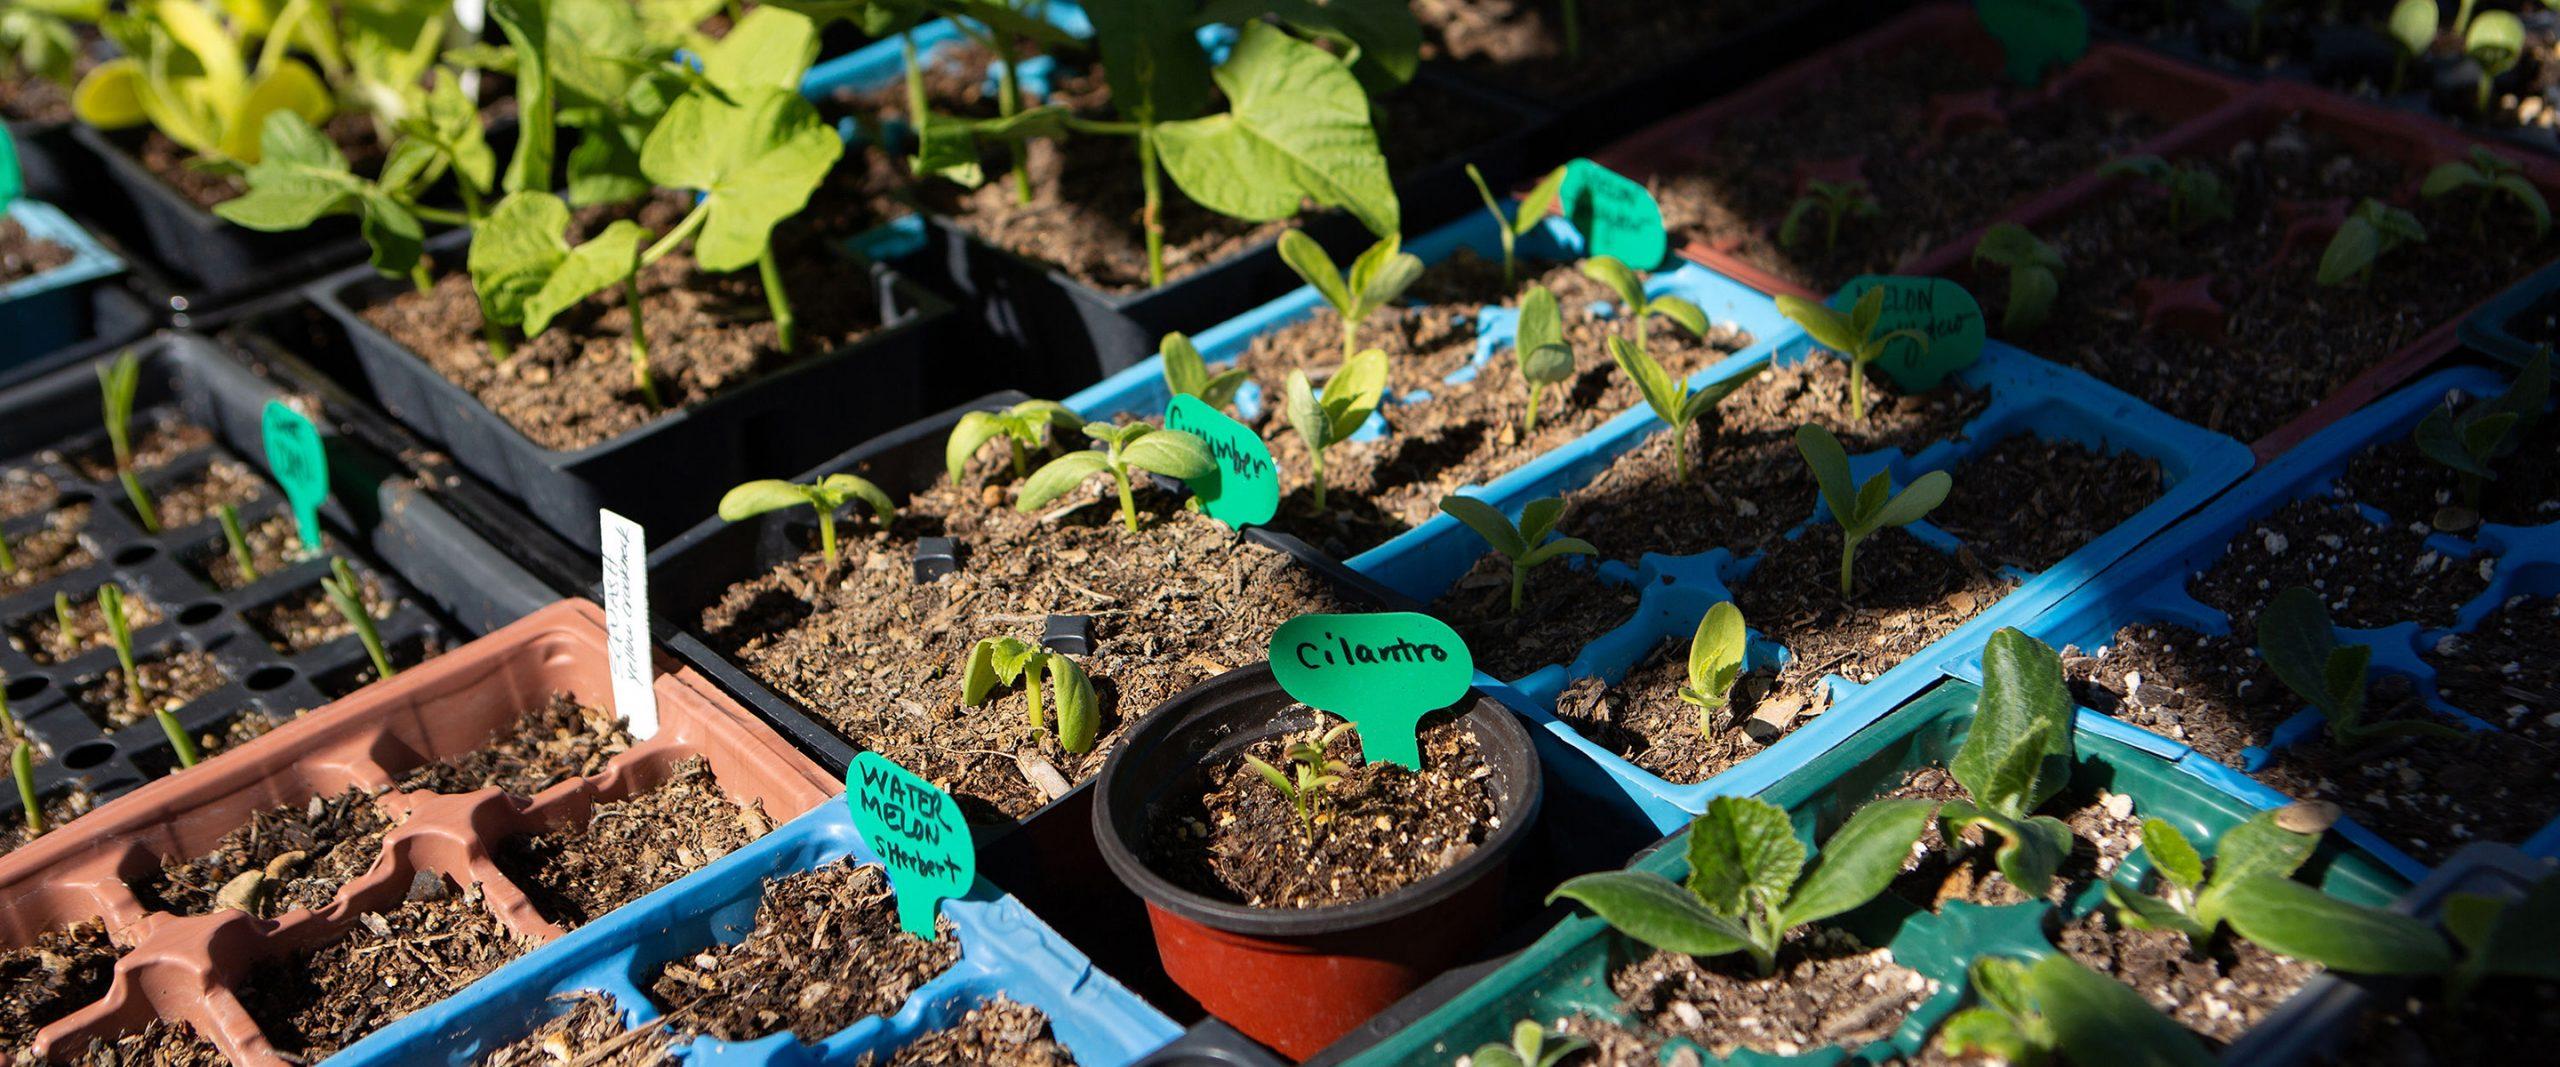 Avery Cramer and the Garden Plot